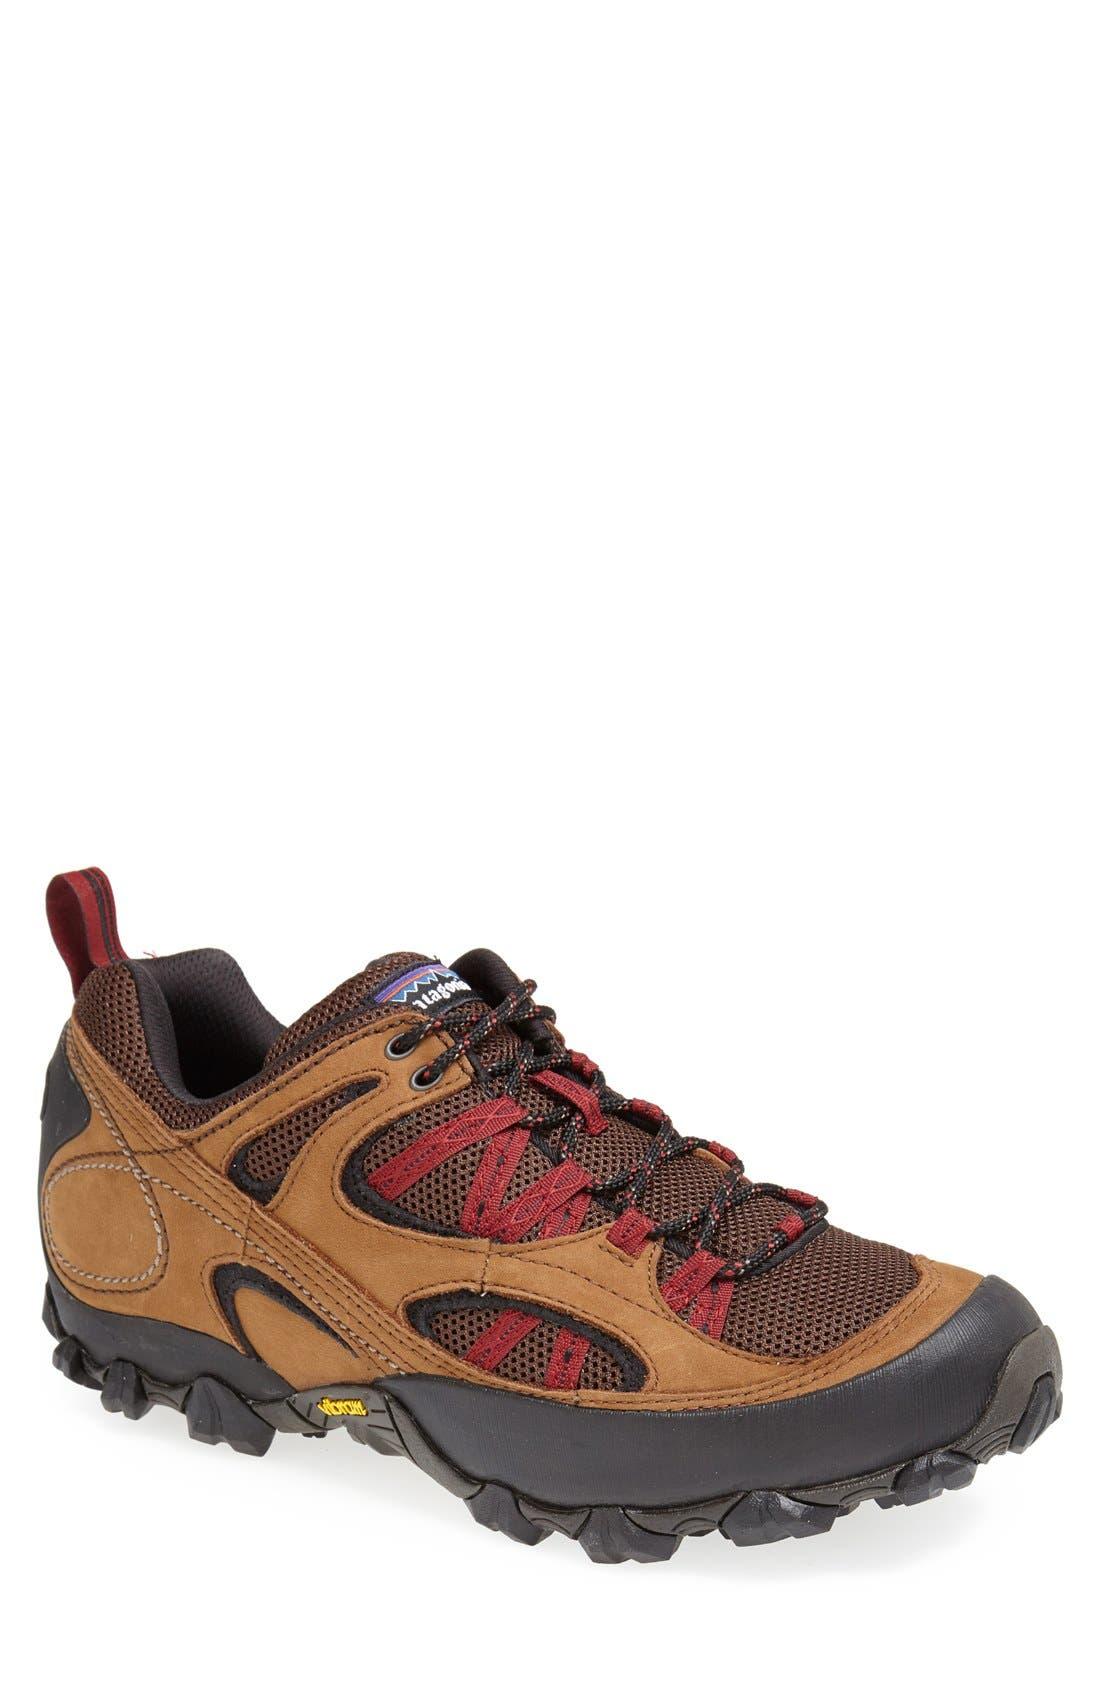 Alternate Image 1 Selected - Patagonia 'Drifter A/C' Trail Shoe (Men)